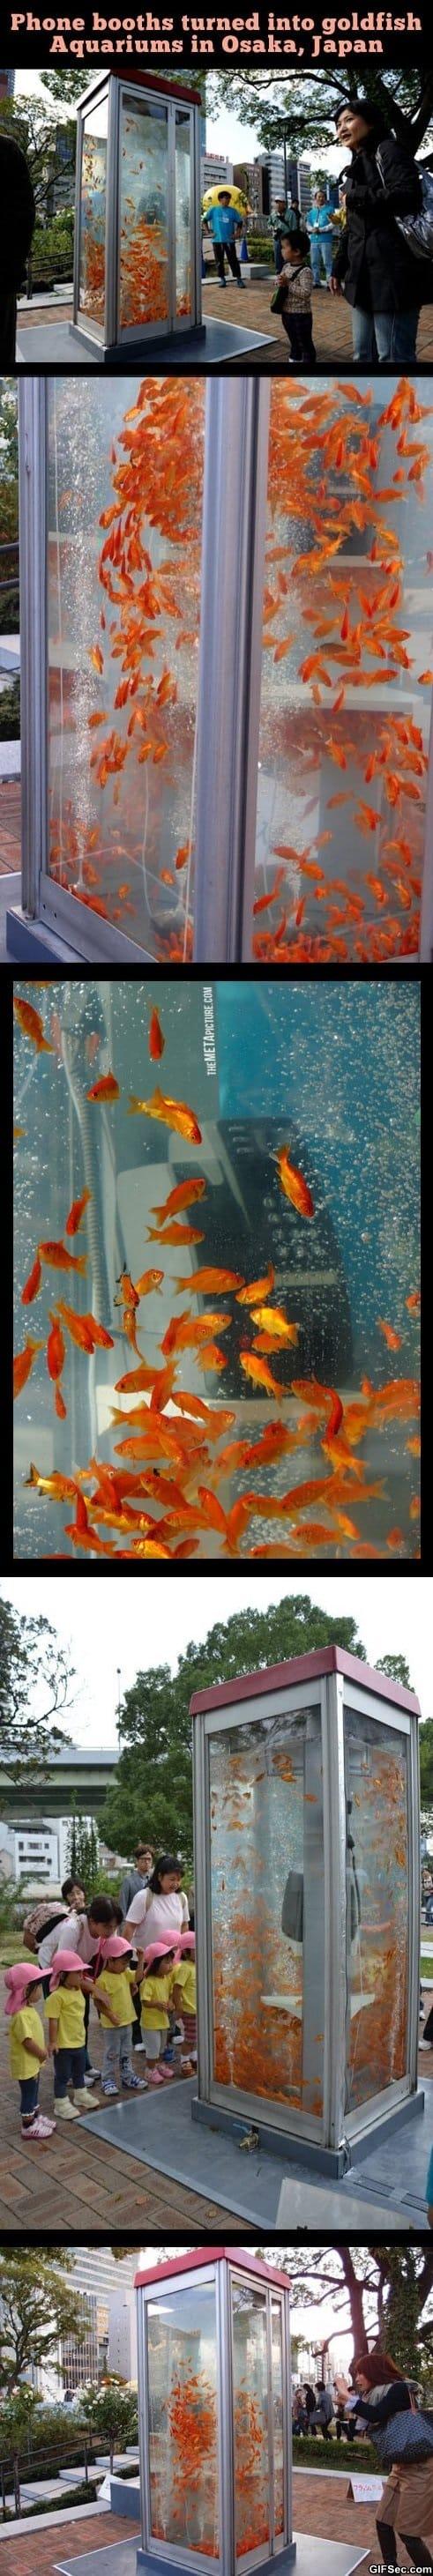 awesome-aquarium-phone-booths